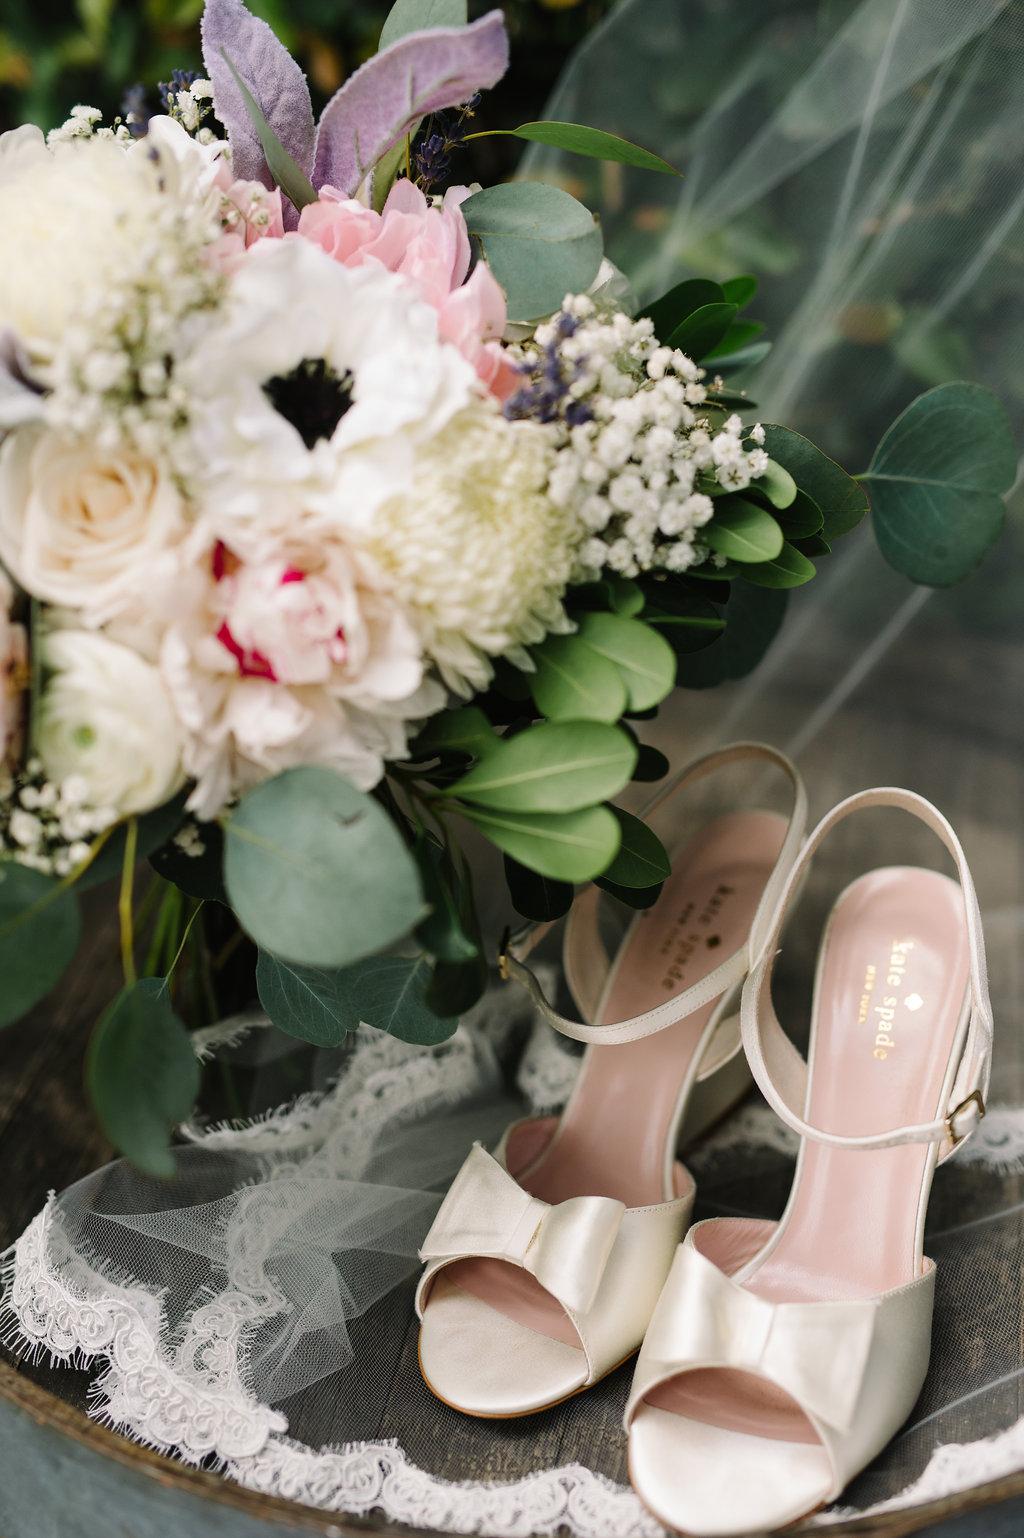 meagan-and-brenden-rach-loves-troy-photography-ivory-and-beau-bridal-boutqiue-ti-adora-wedding-dress-gold-lace-wedding-dress-savannah-wedding-planner-savannah-weddings-oldfield-plantation-wedding-savannah-florist-7.jpg